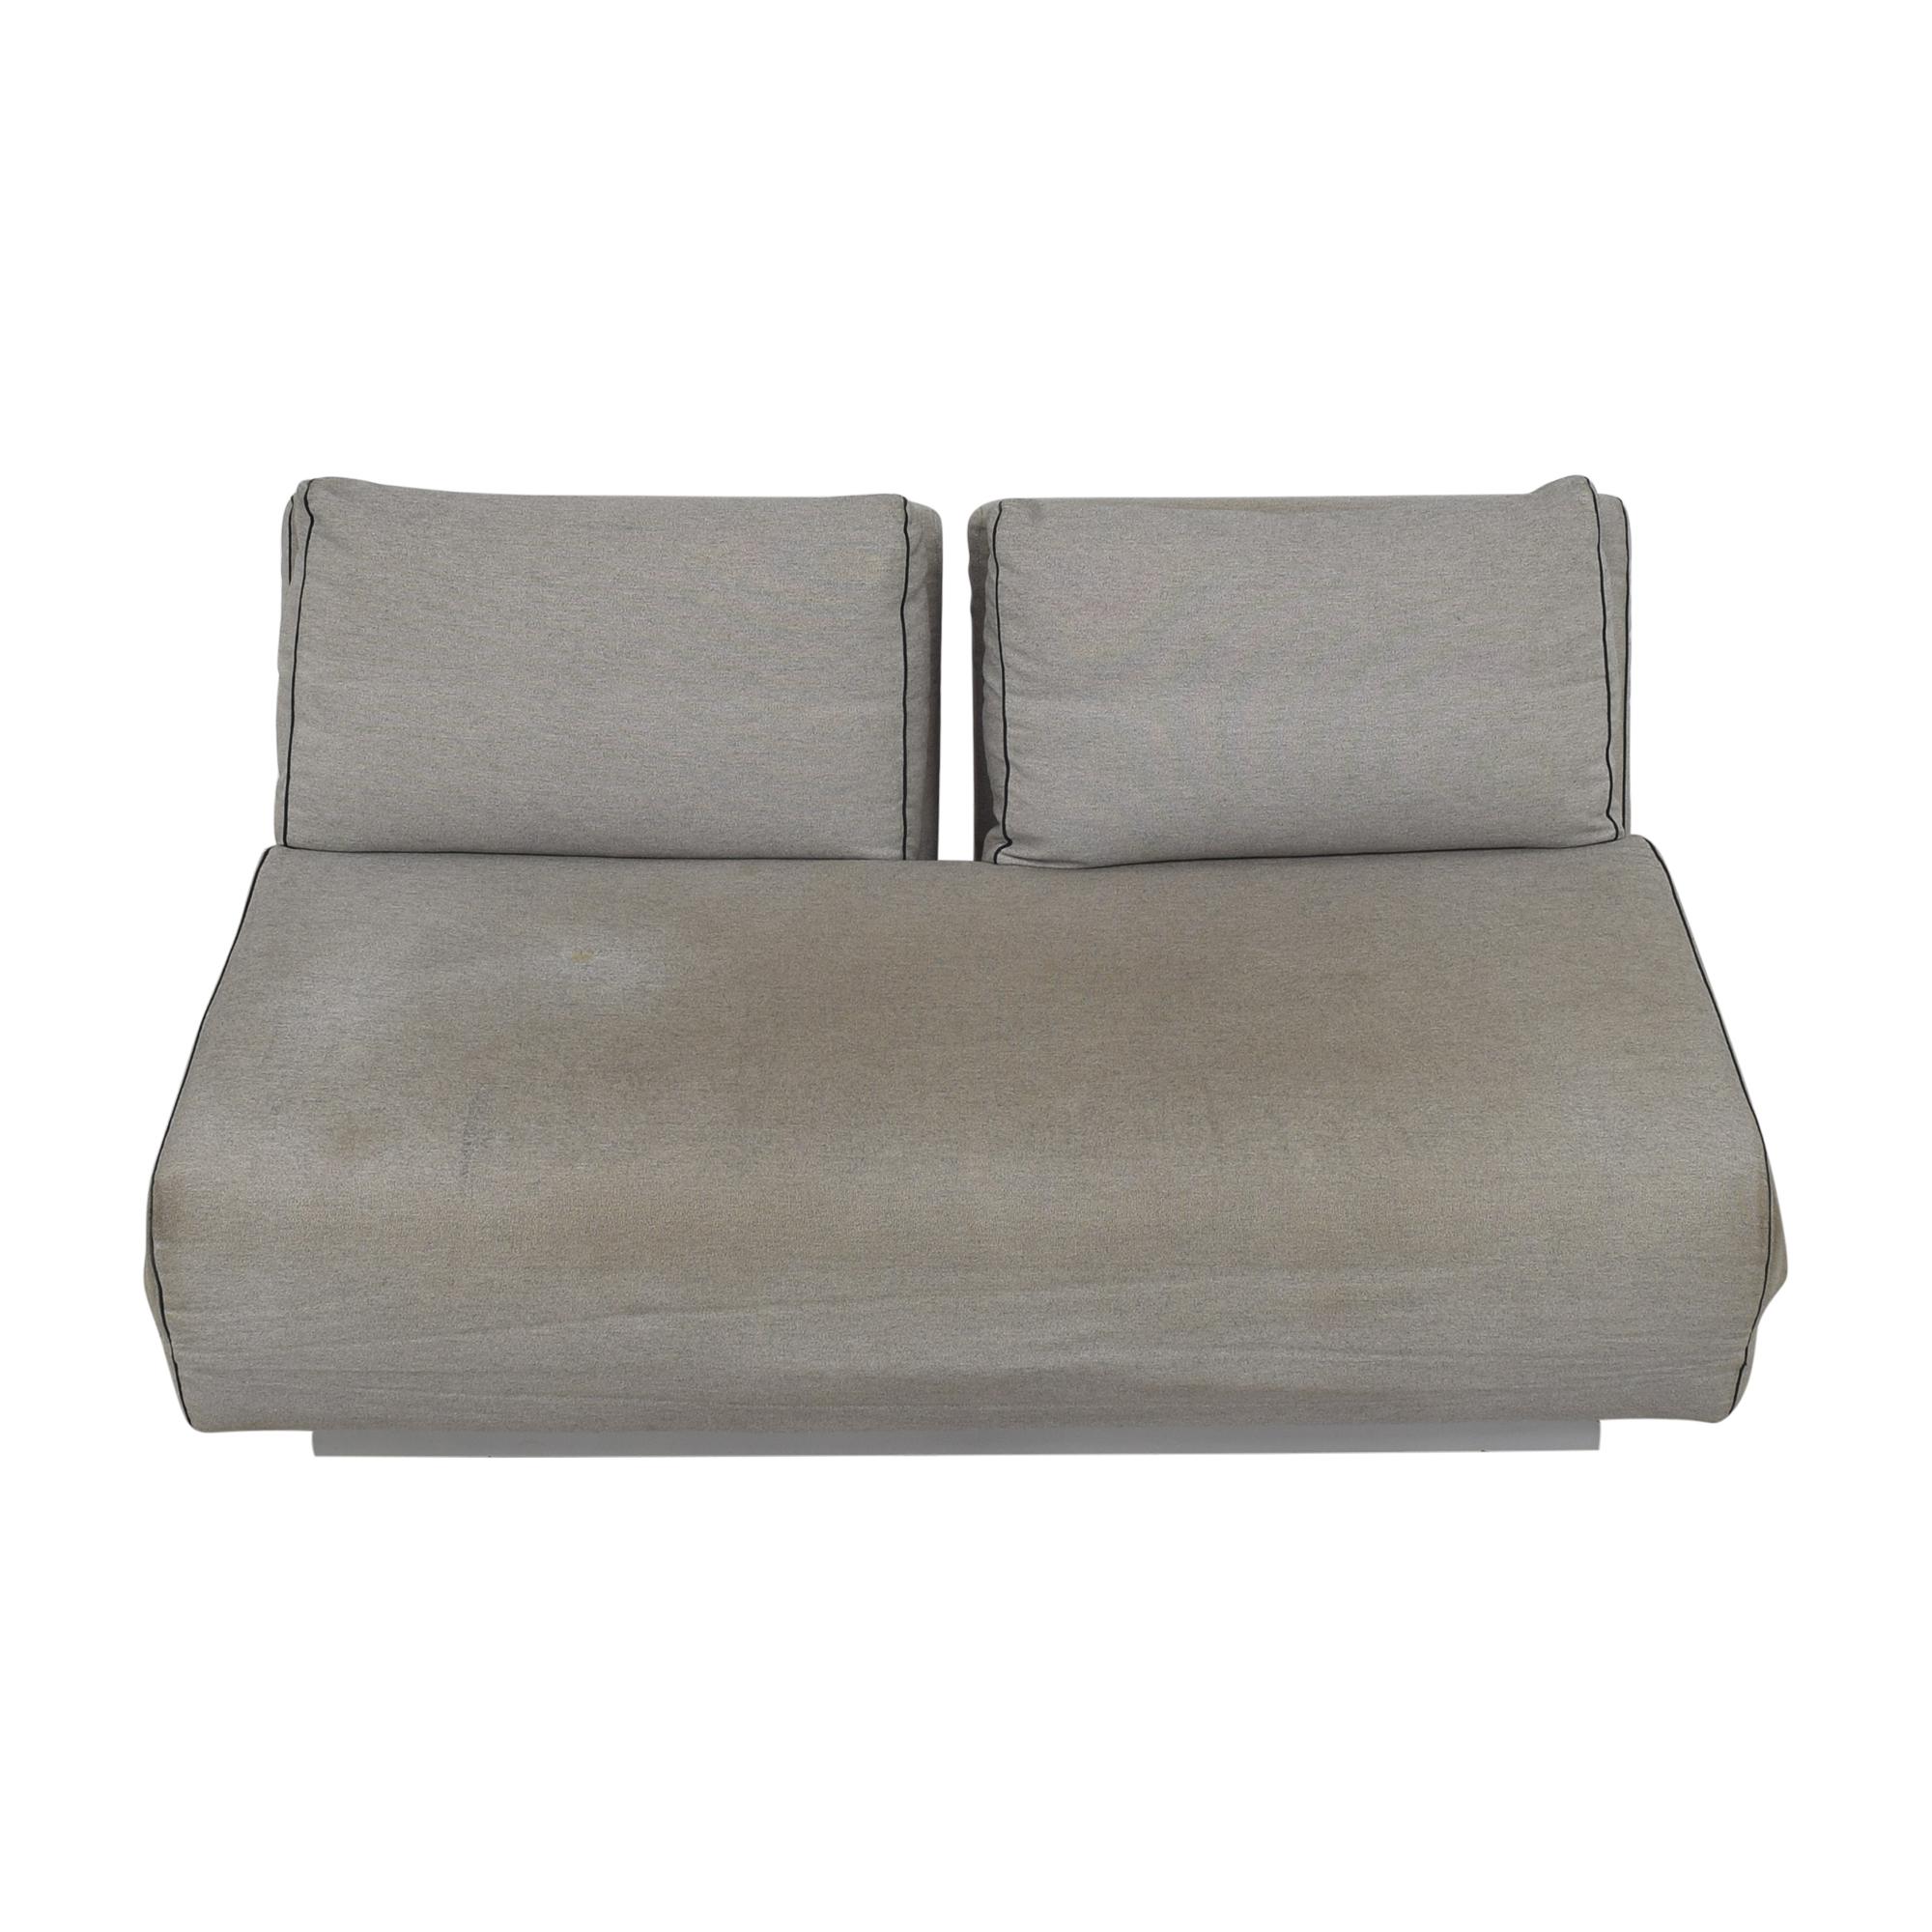 Softline City 2.5 Seater Sofa Bed sale